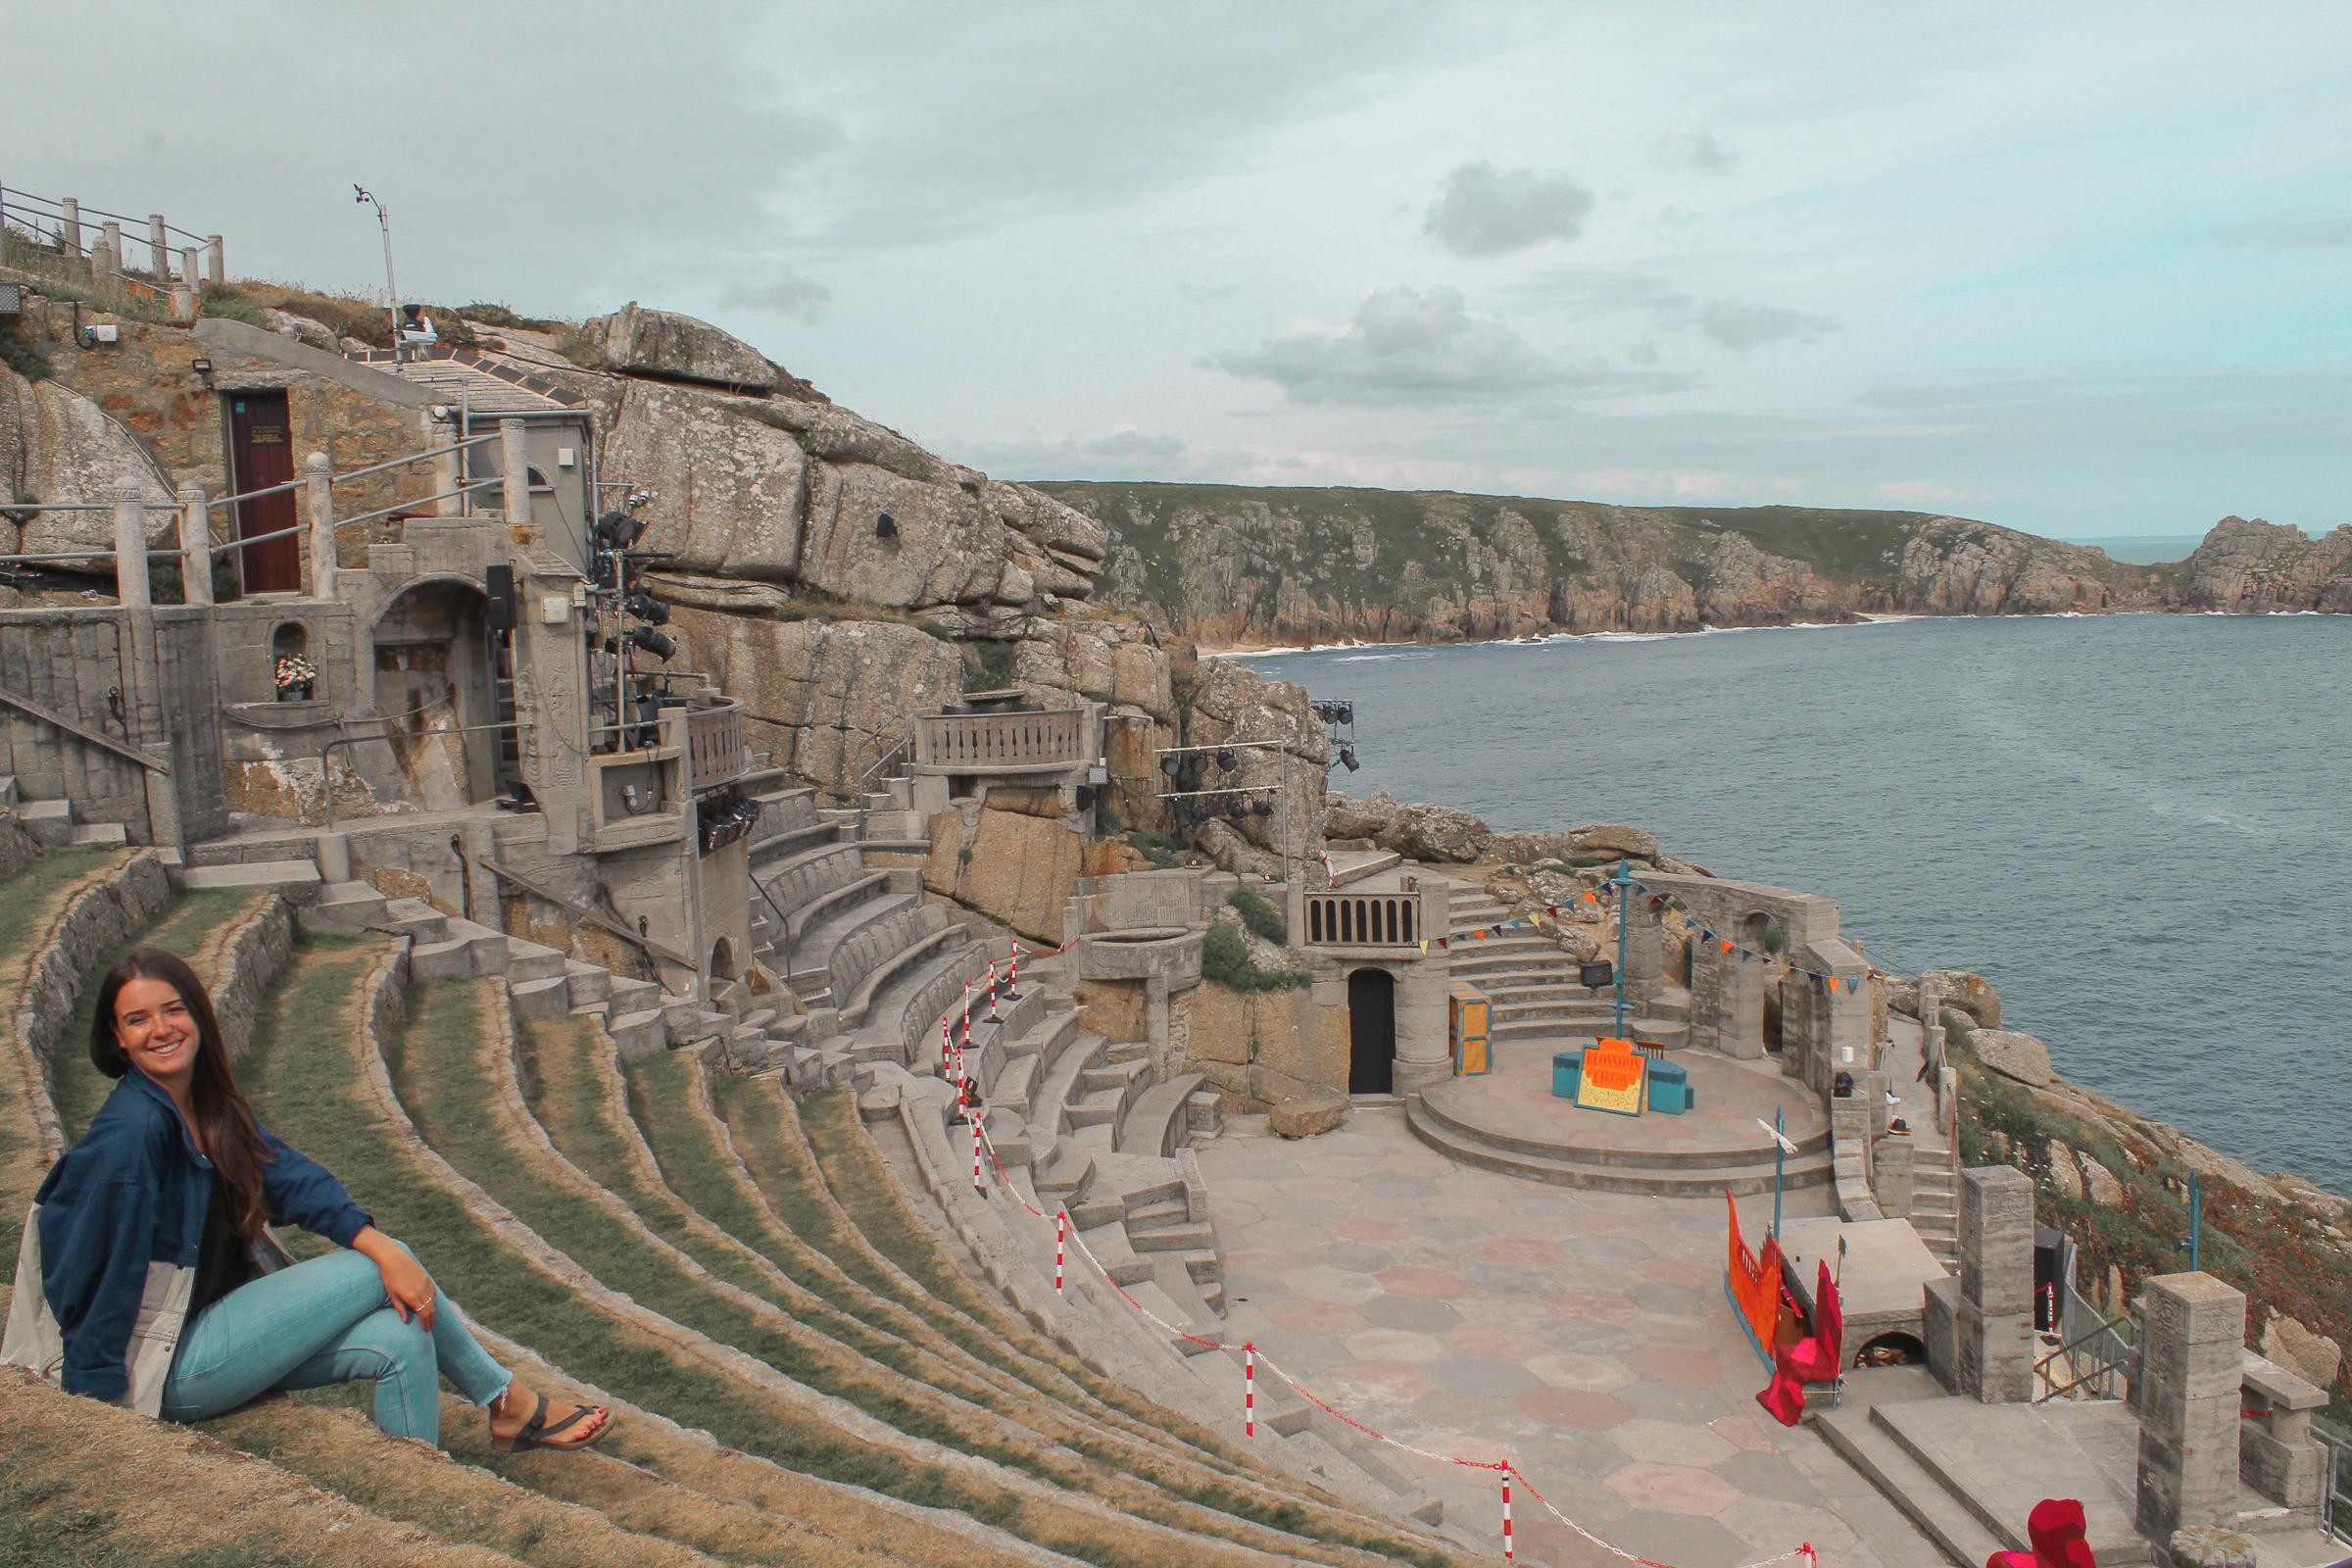 the Minack Theatre in Cornwall